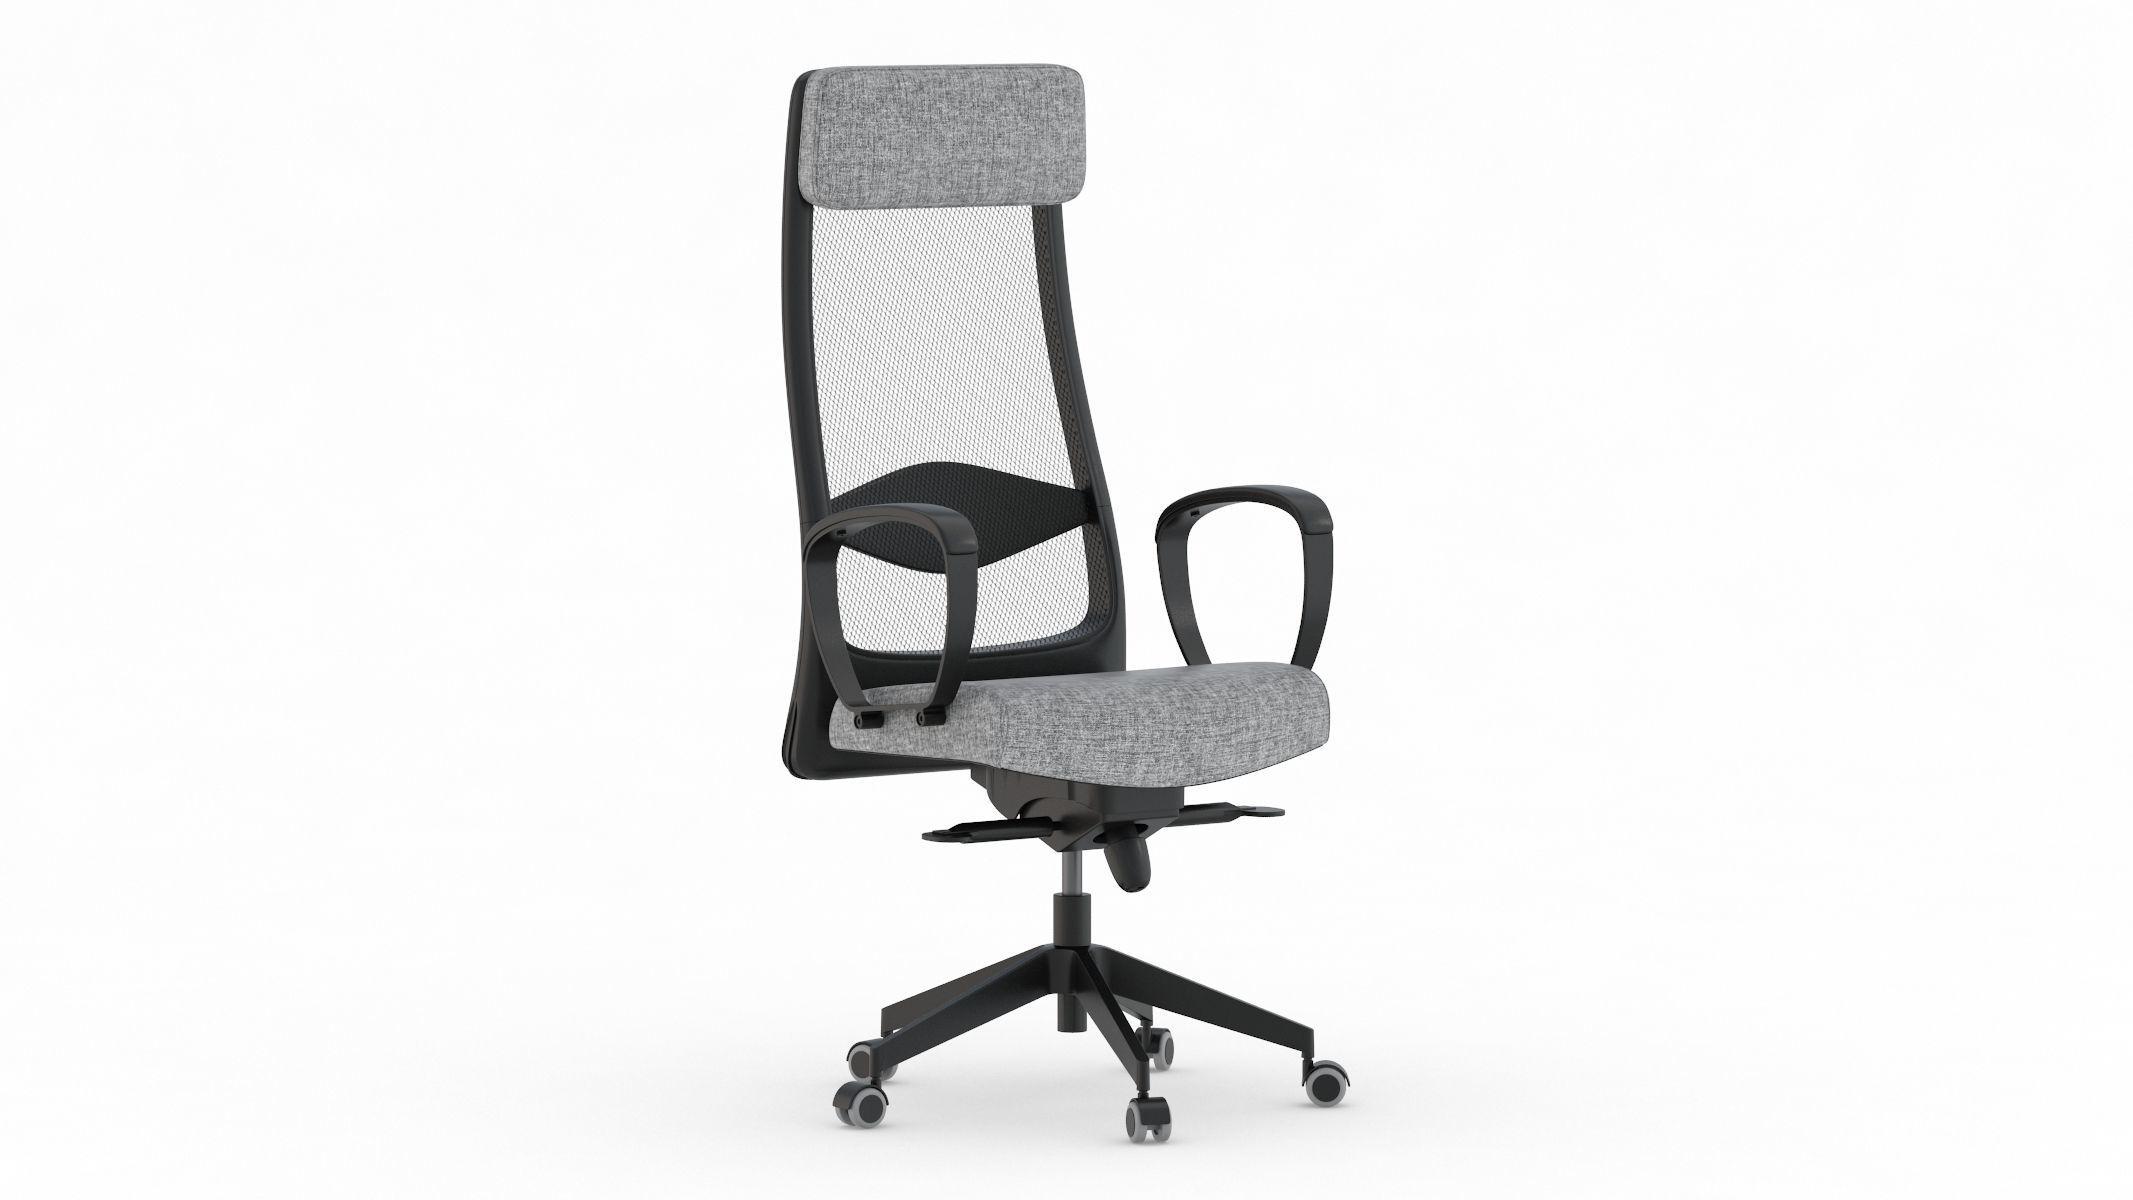 Ikea Markus Office Chair Cgtrader